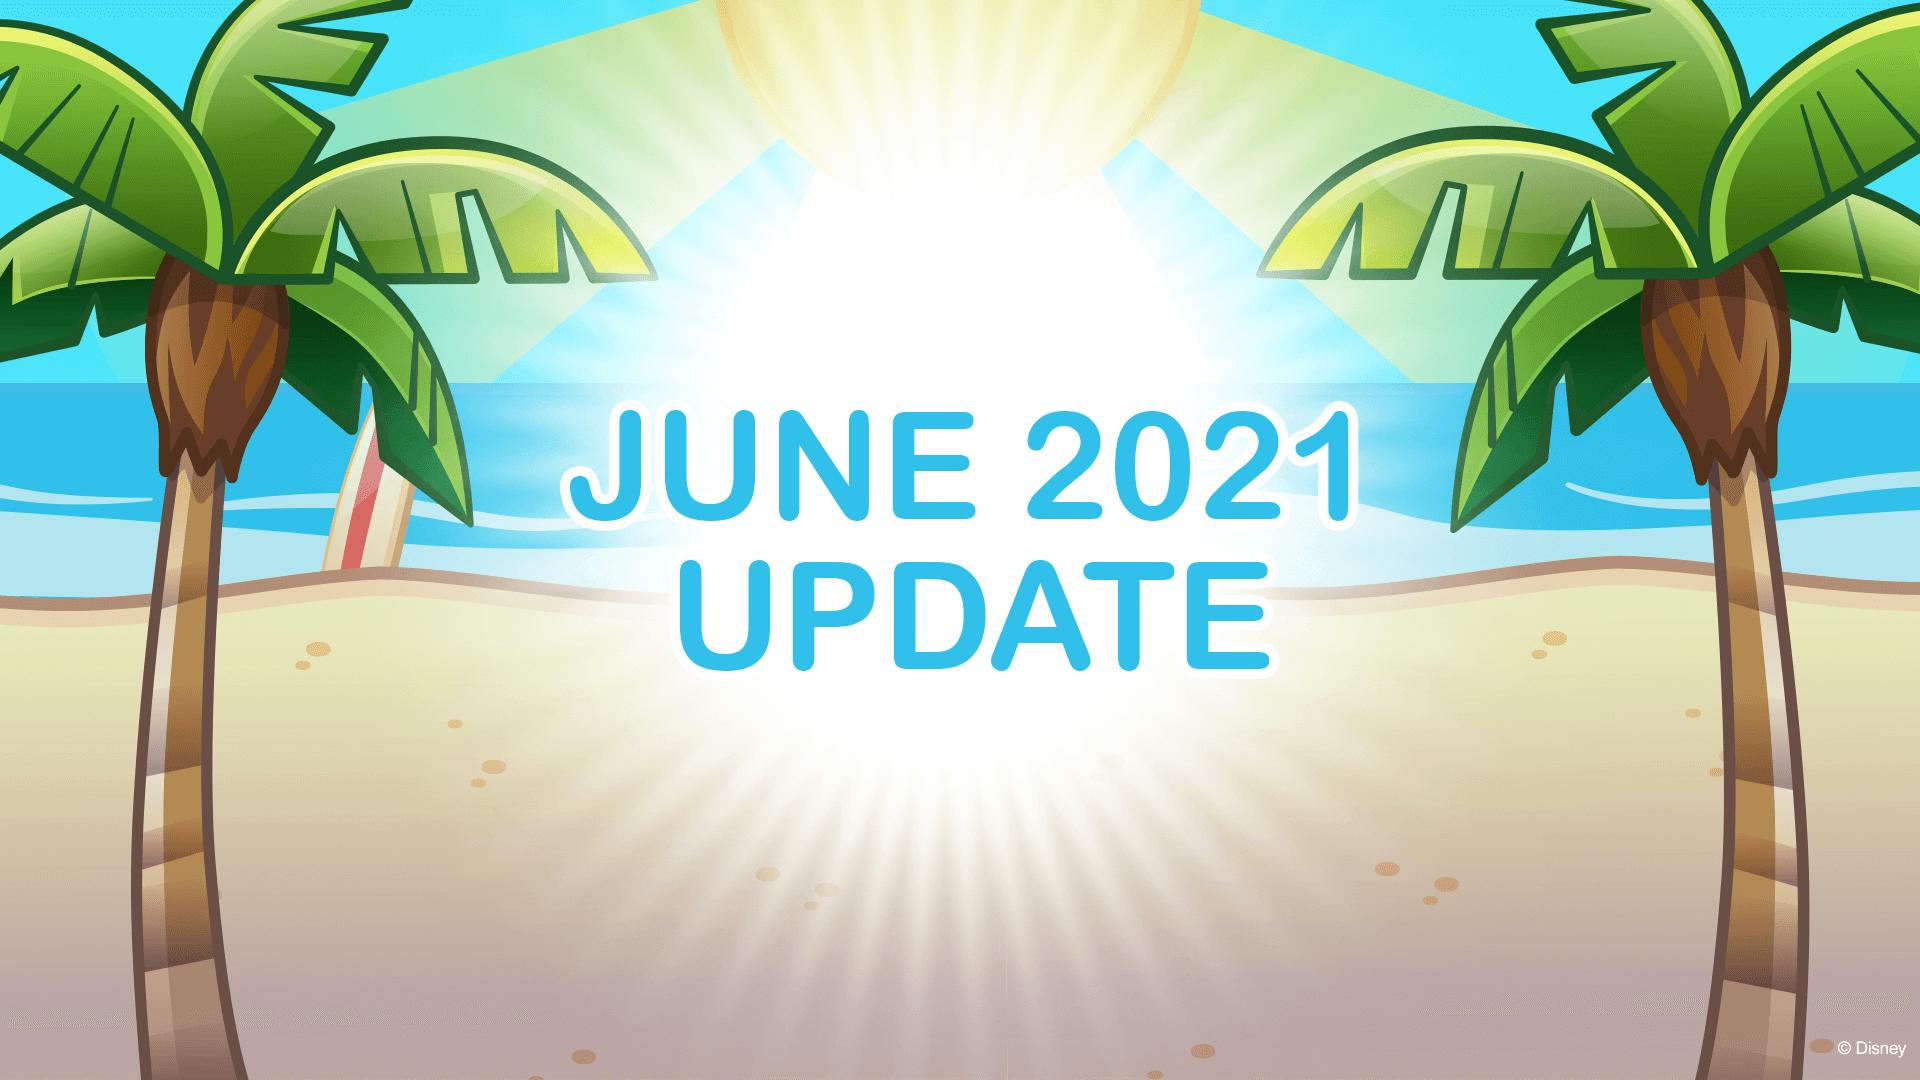 June 2021 Update, Featured Graphic